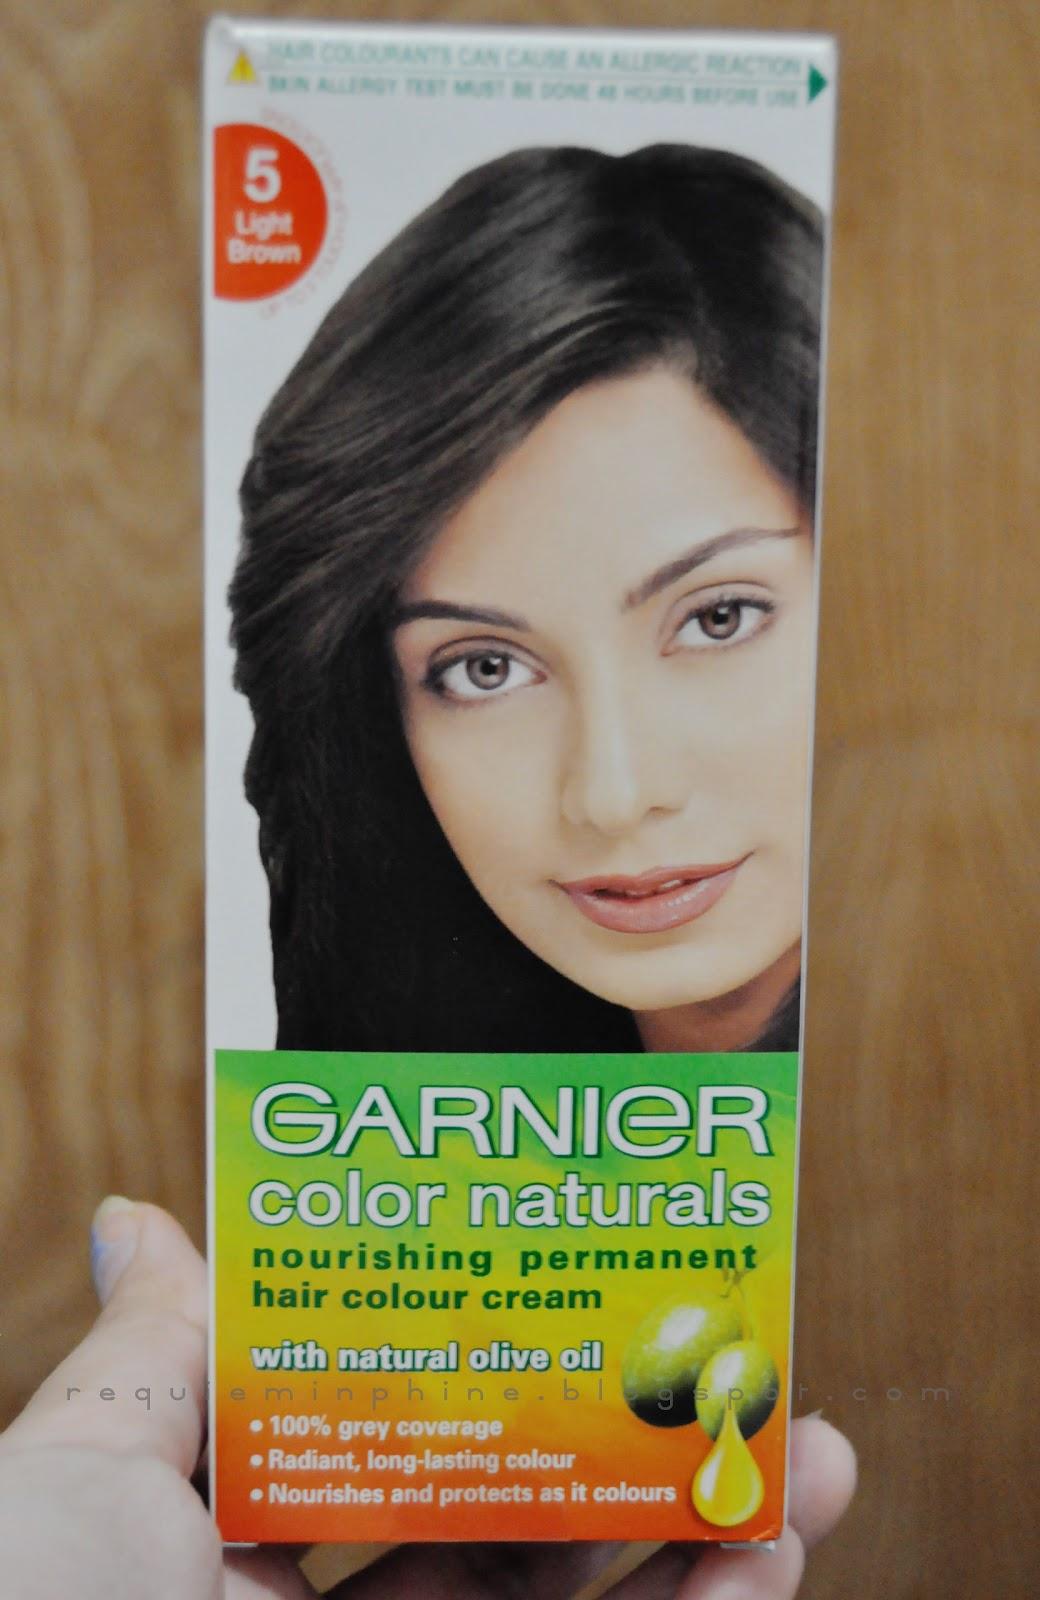 Cantarella Review Garnier Color Naturals In 5 Light Brown Lets Start